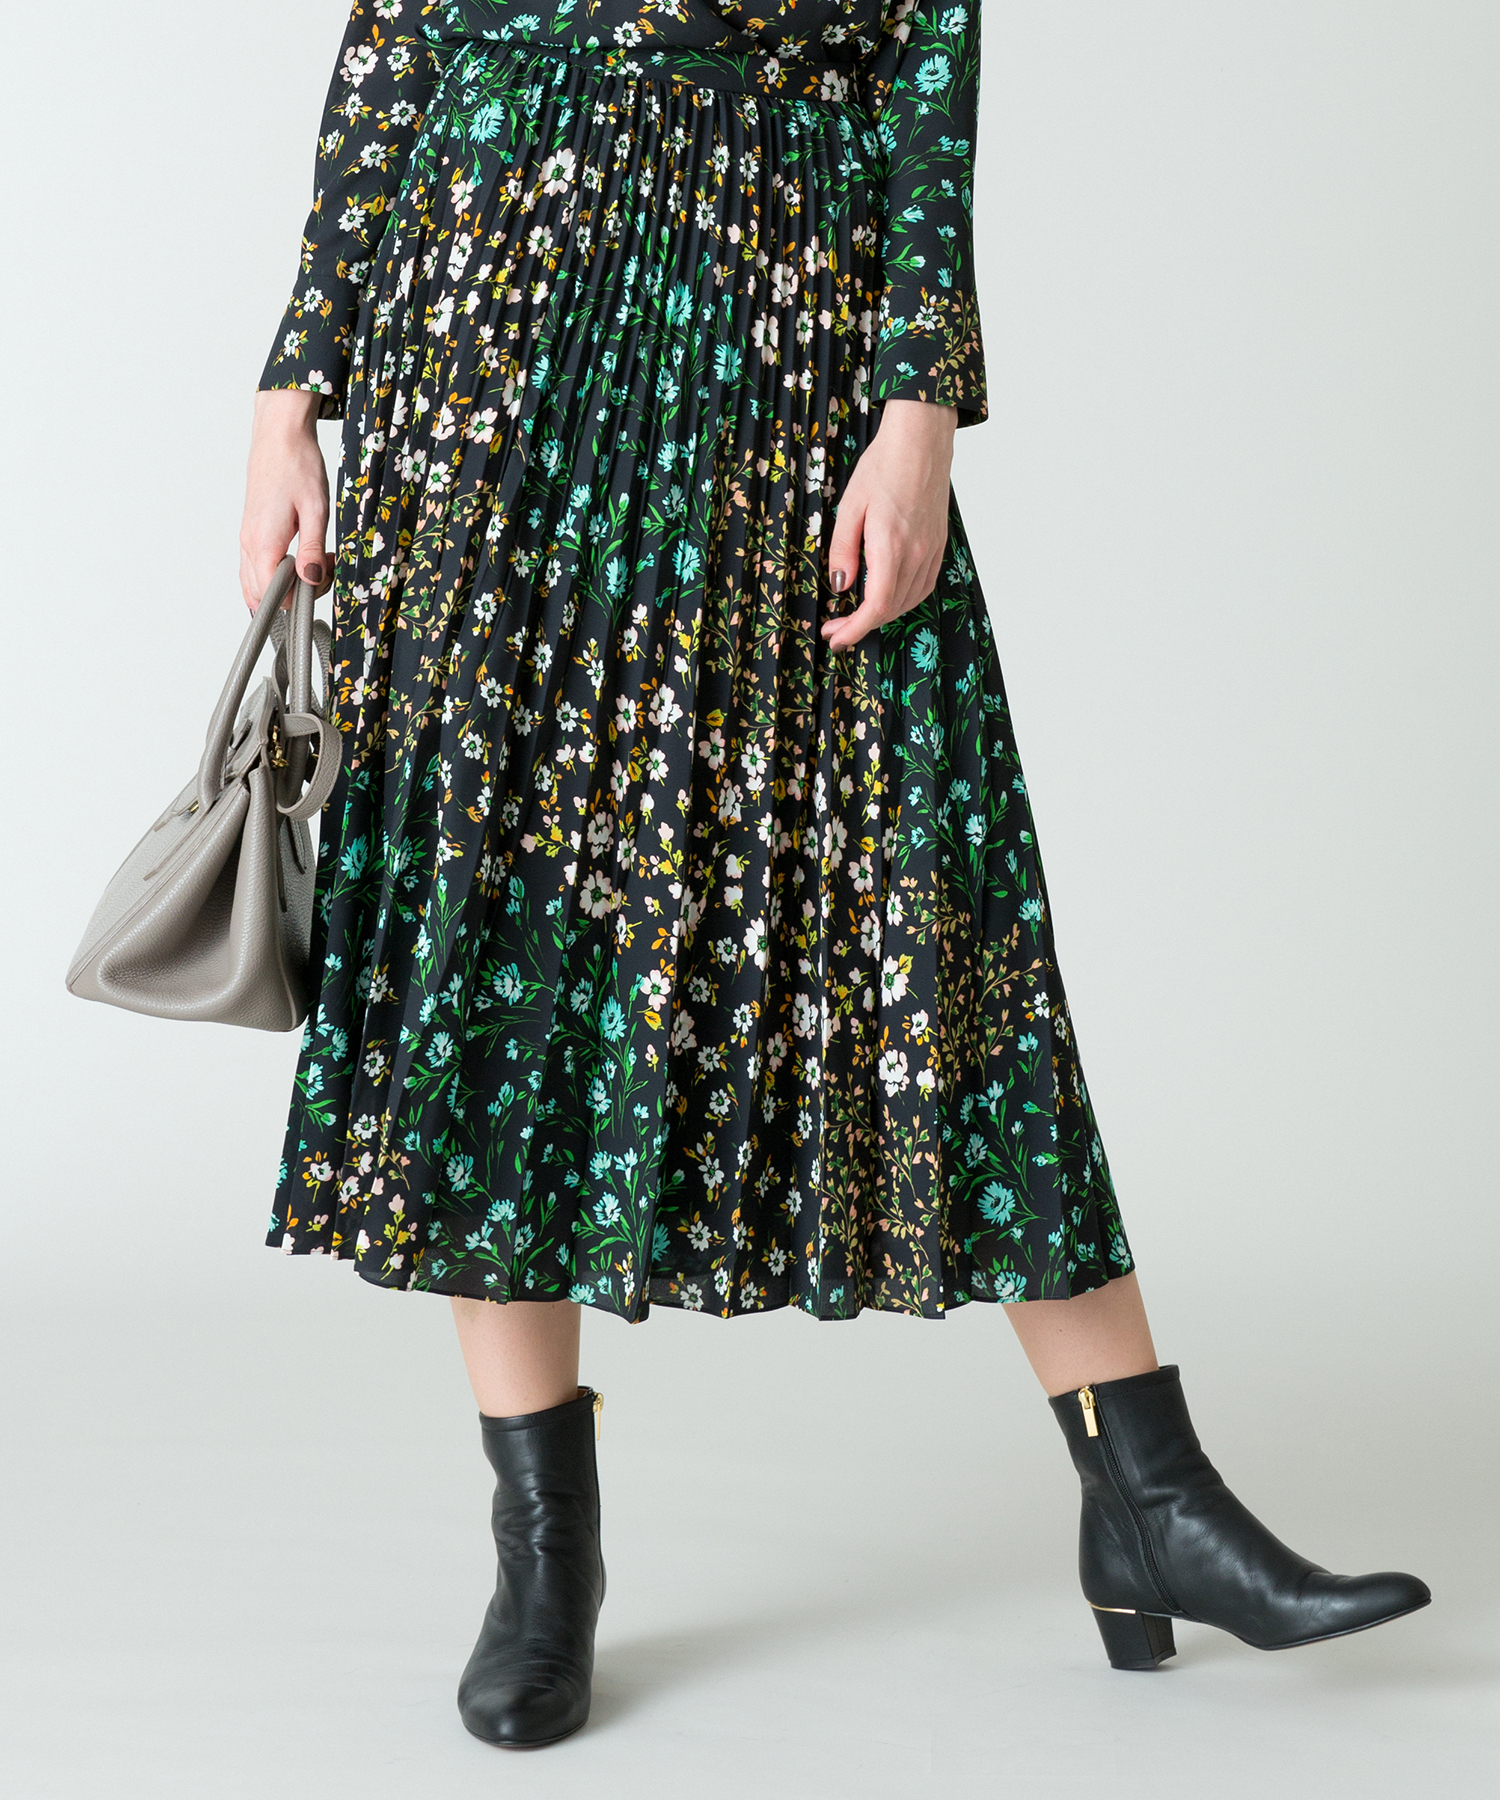 【LOULOU WILLOUGHBY】パッチワークフラワープリーツスカート